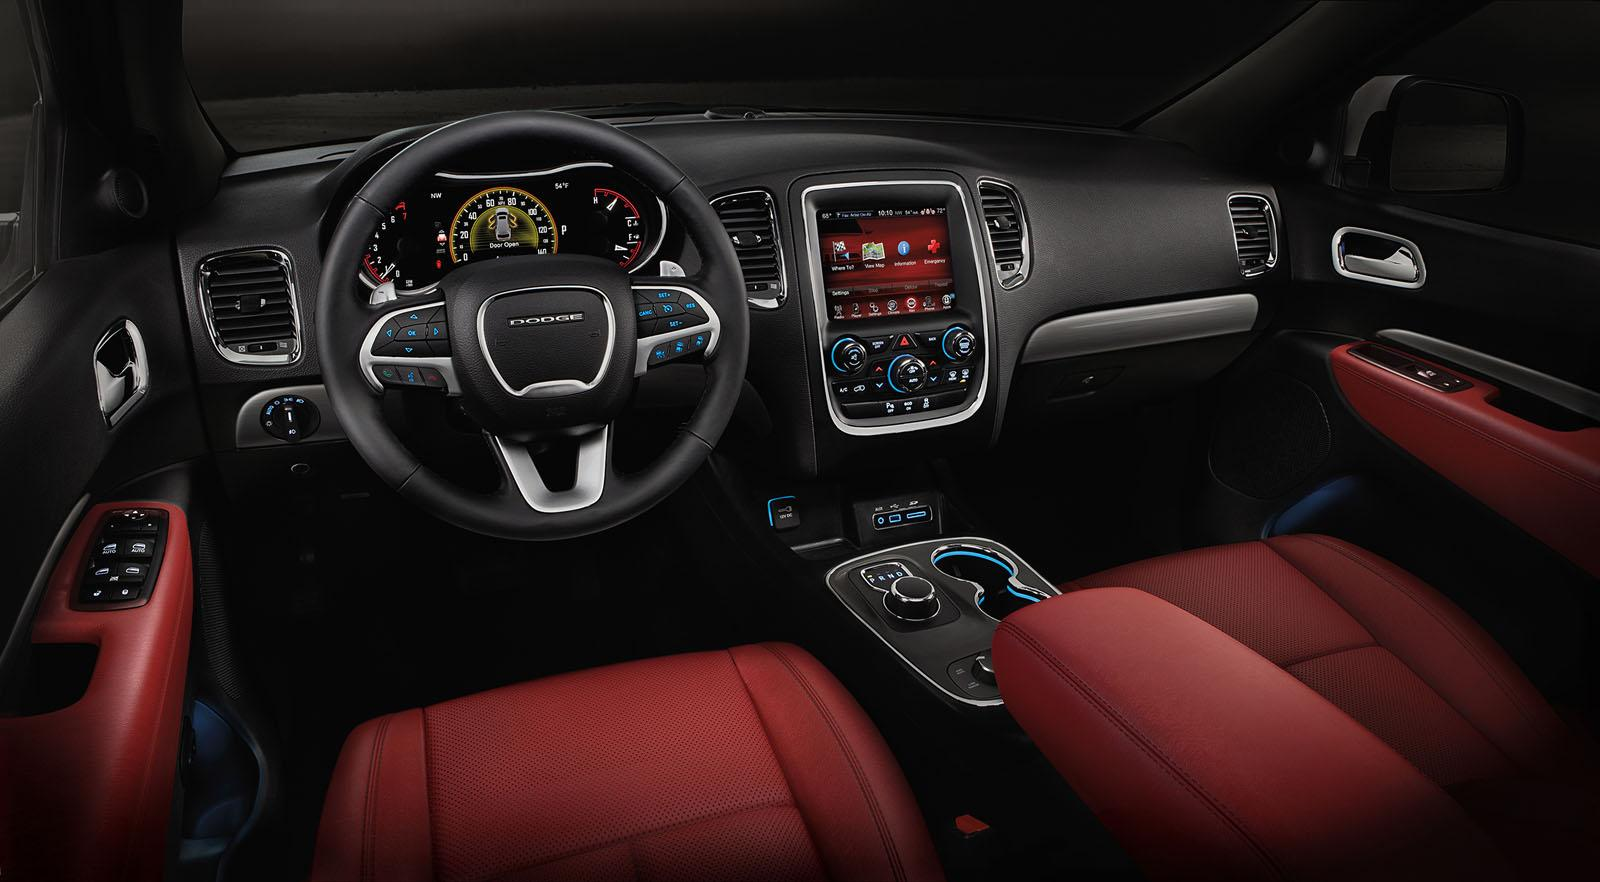 2015 Dodge Durango Radar Red Nappa Leather Seats Now